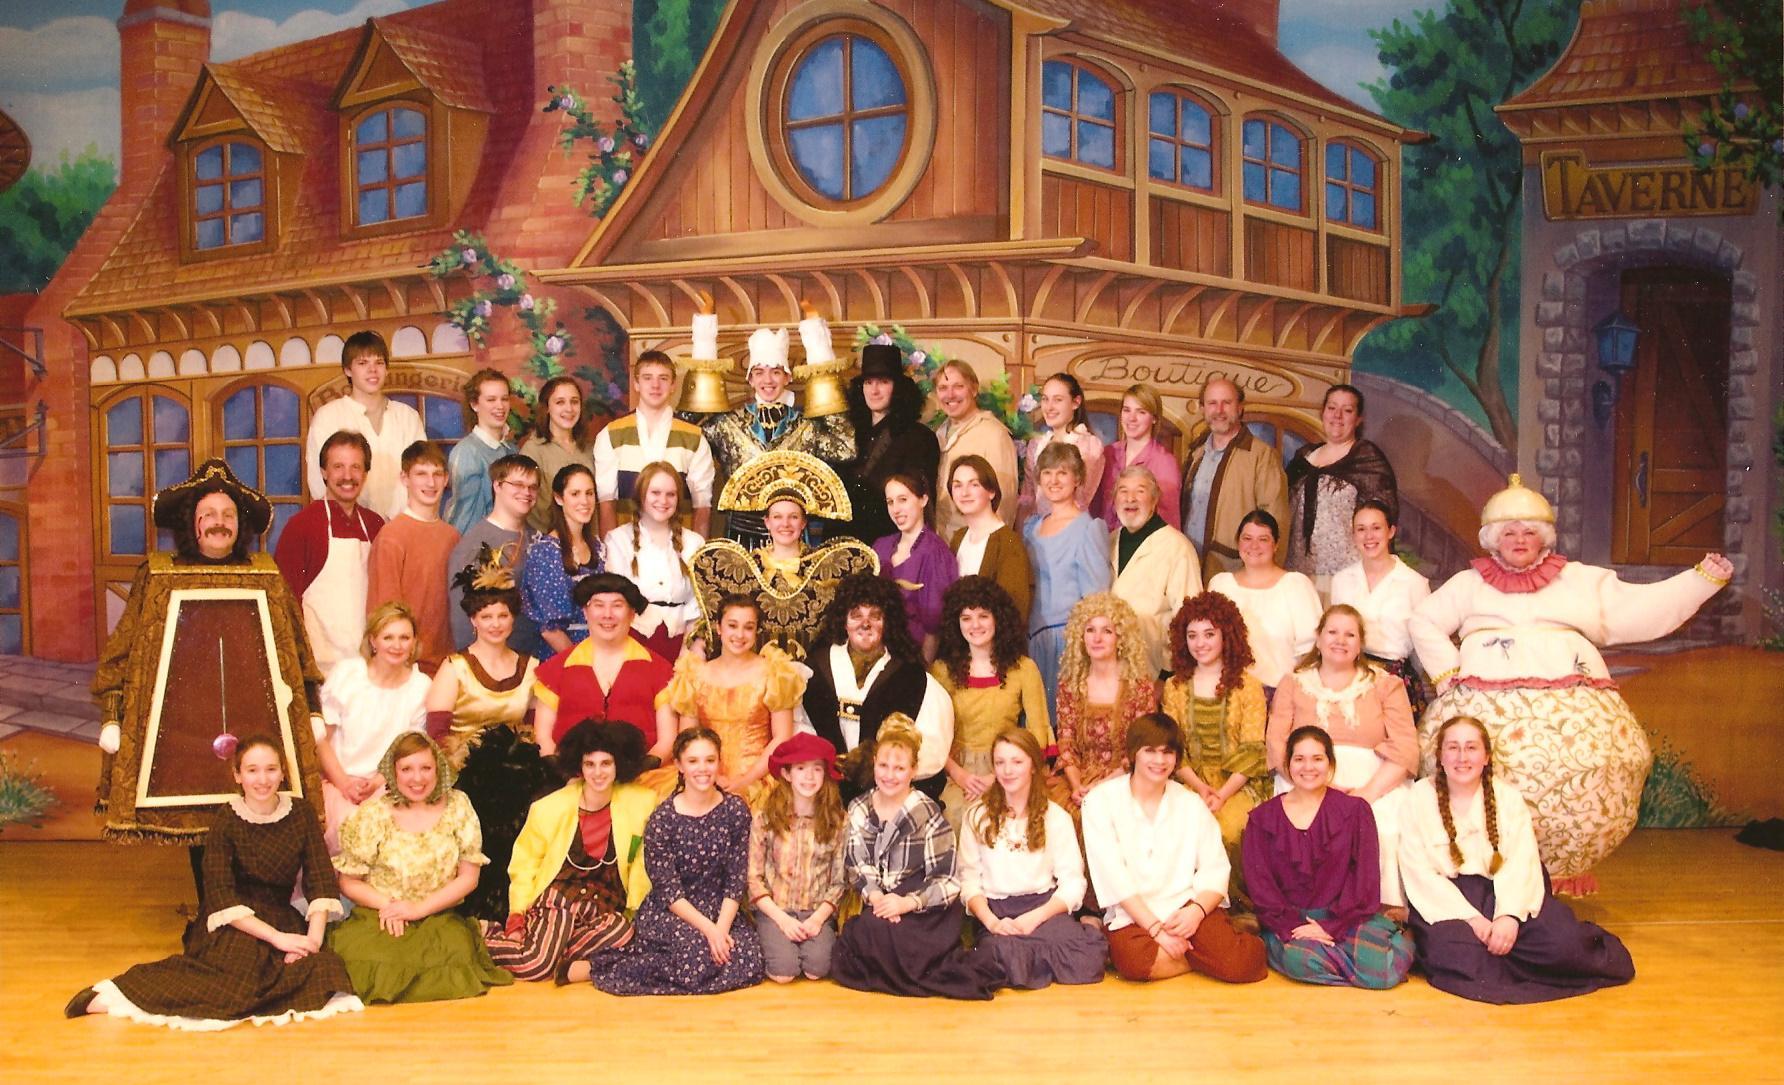 OCT Now! - Olean (NY) Community Theatre, Inc.